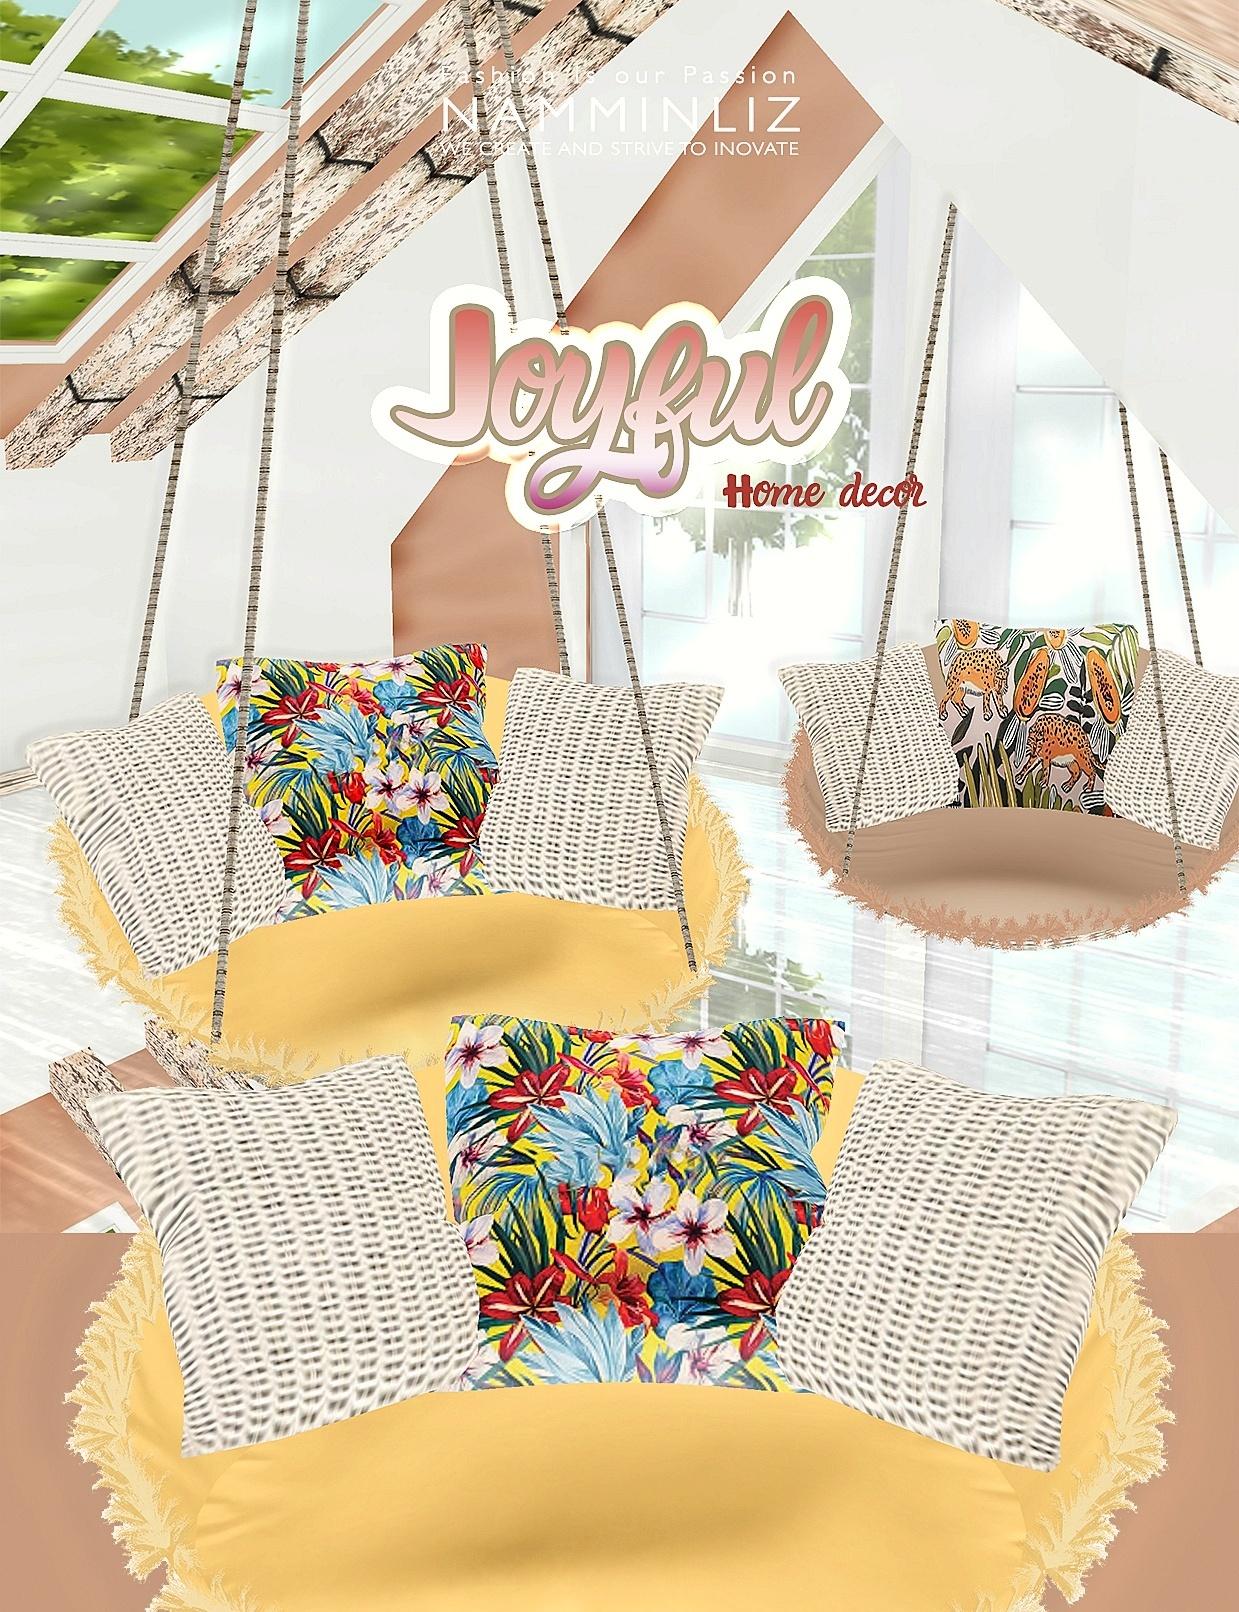 Joyful home 48 Textures PNG - 12 *. CHKN